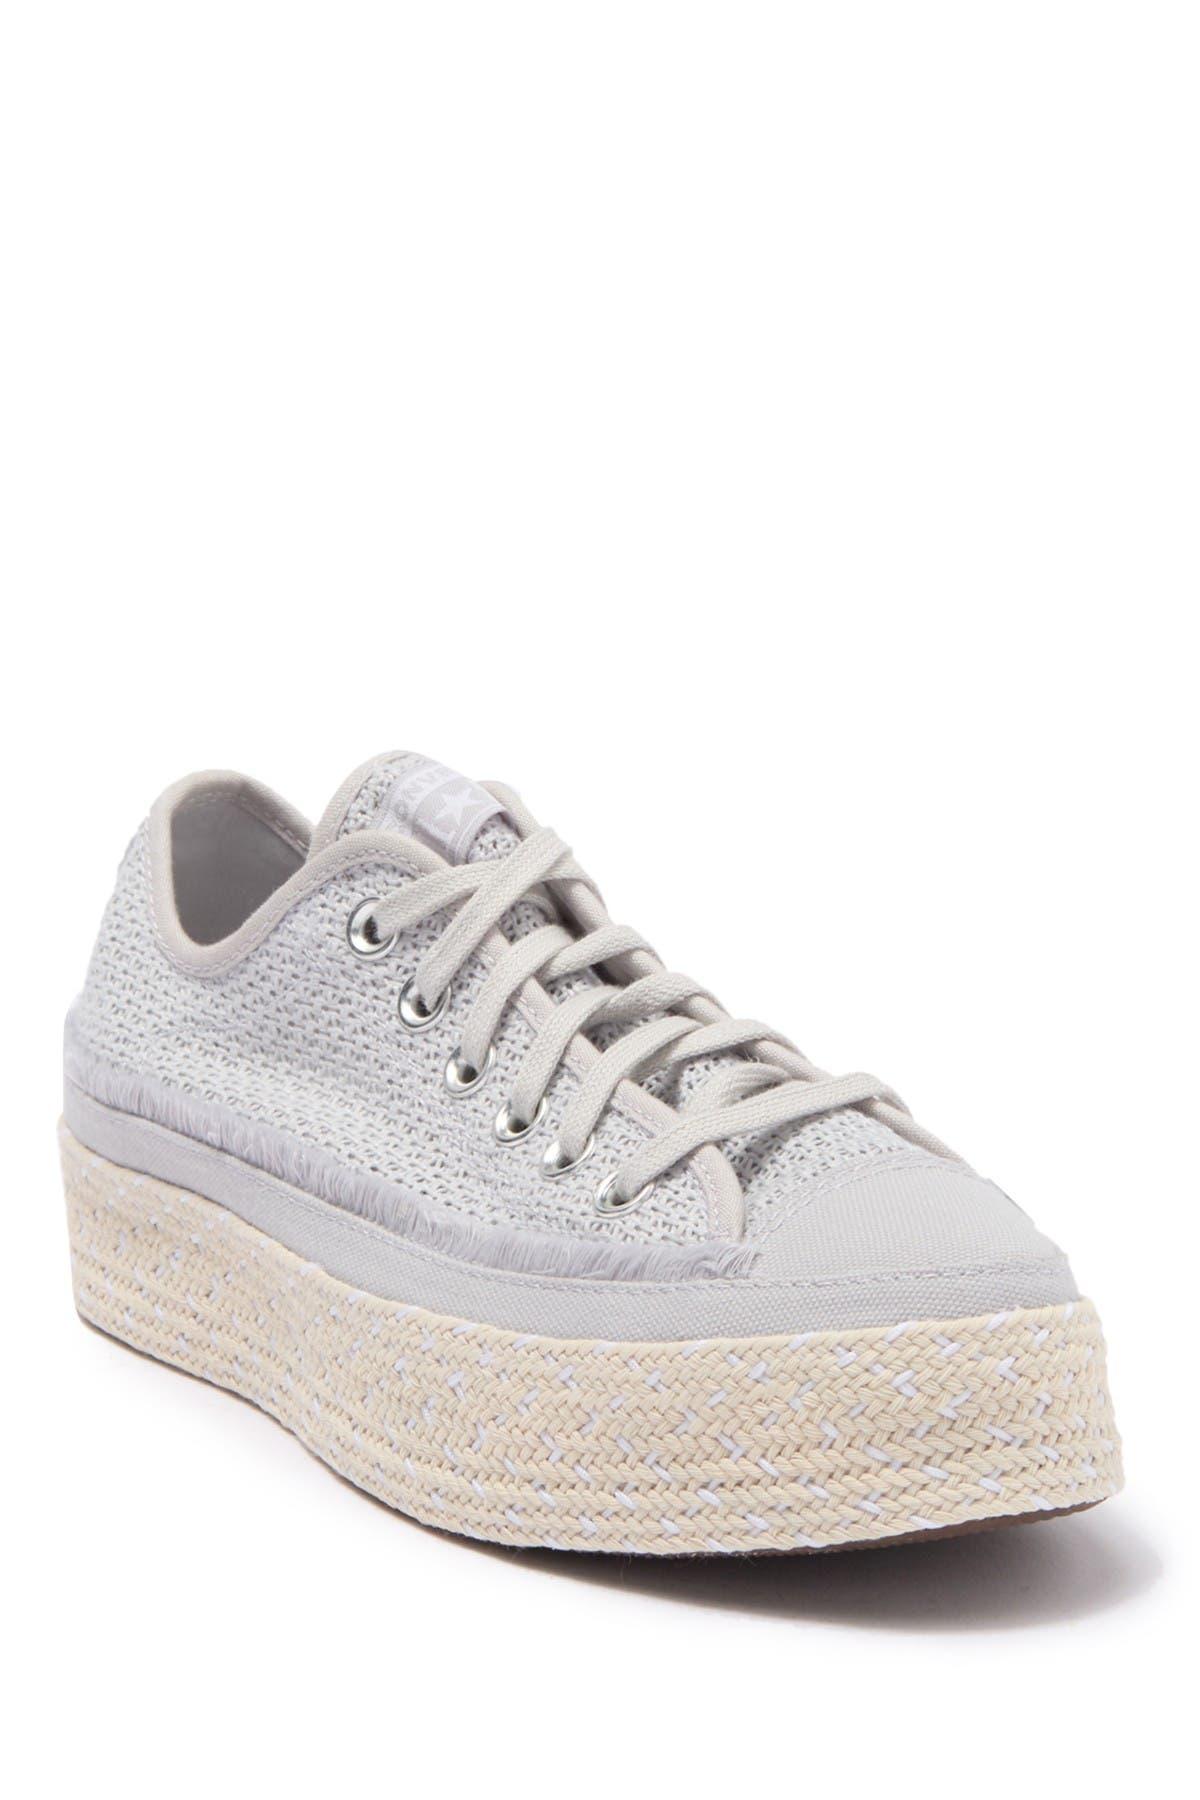 Image of Converse Espadrille Platform Sneaker